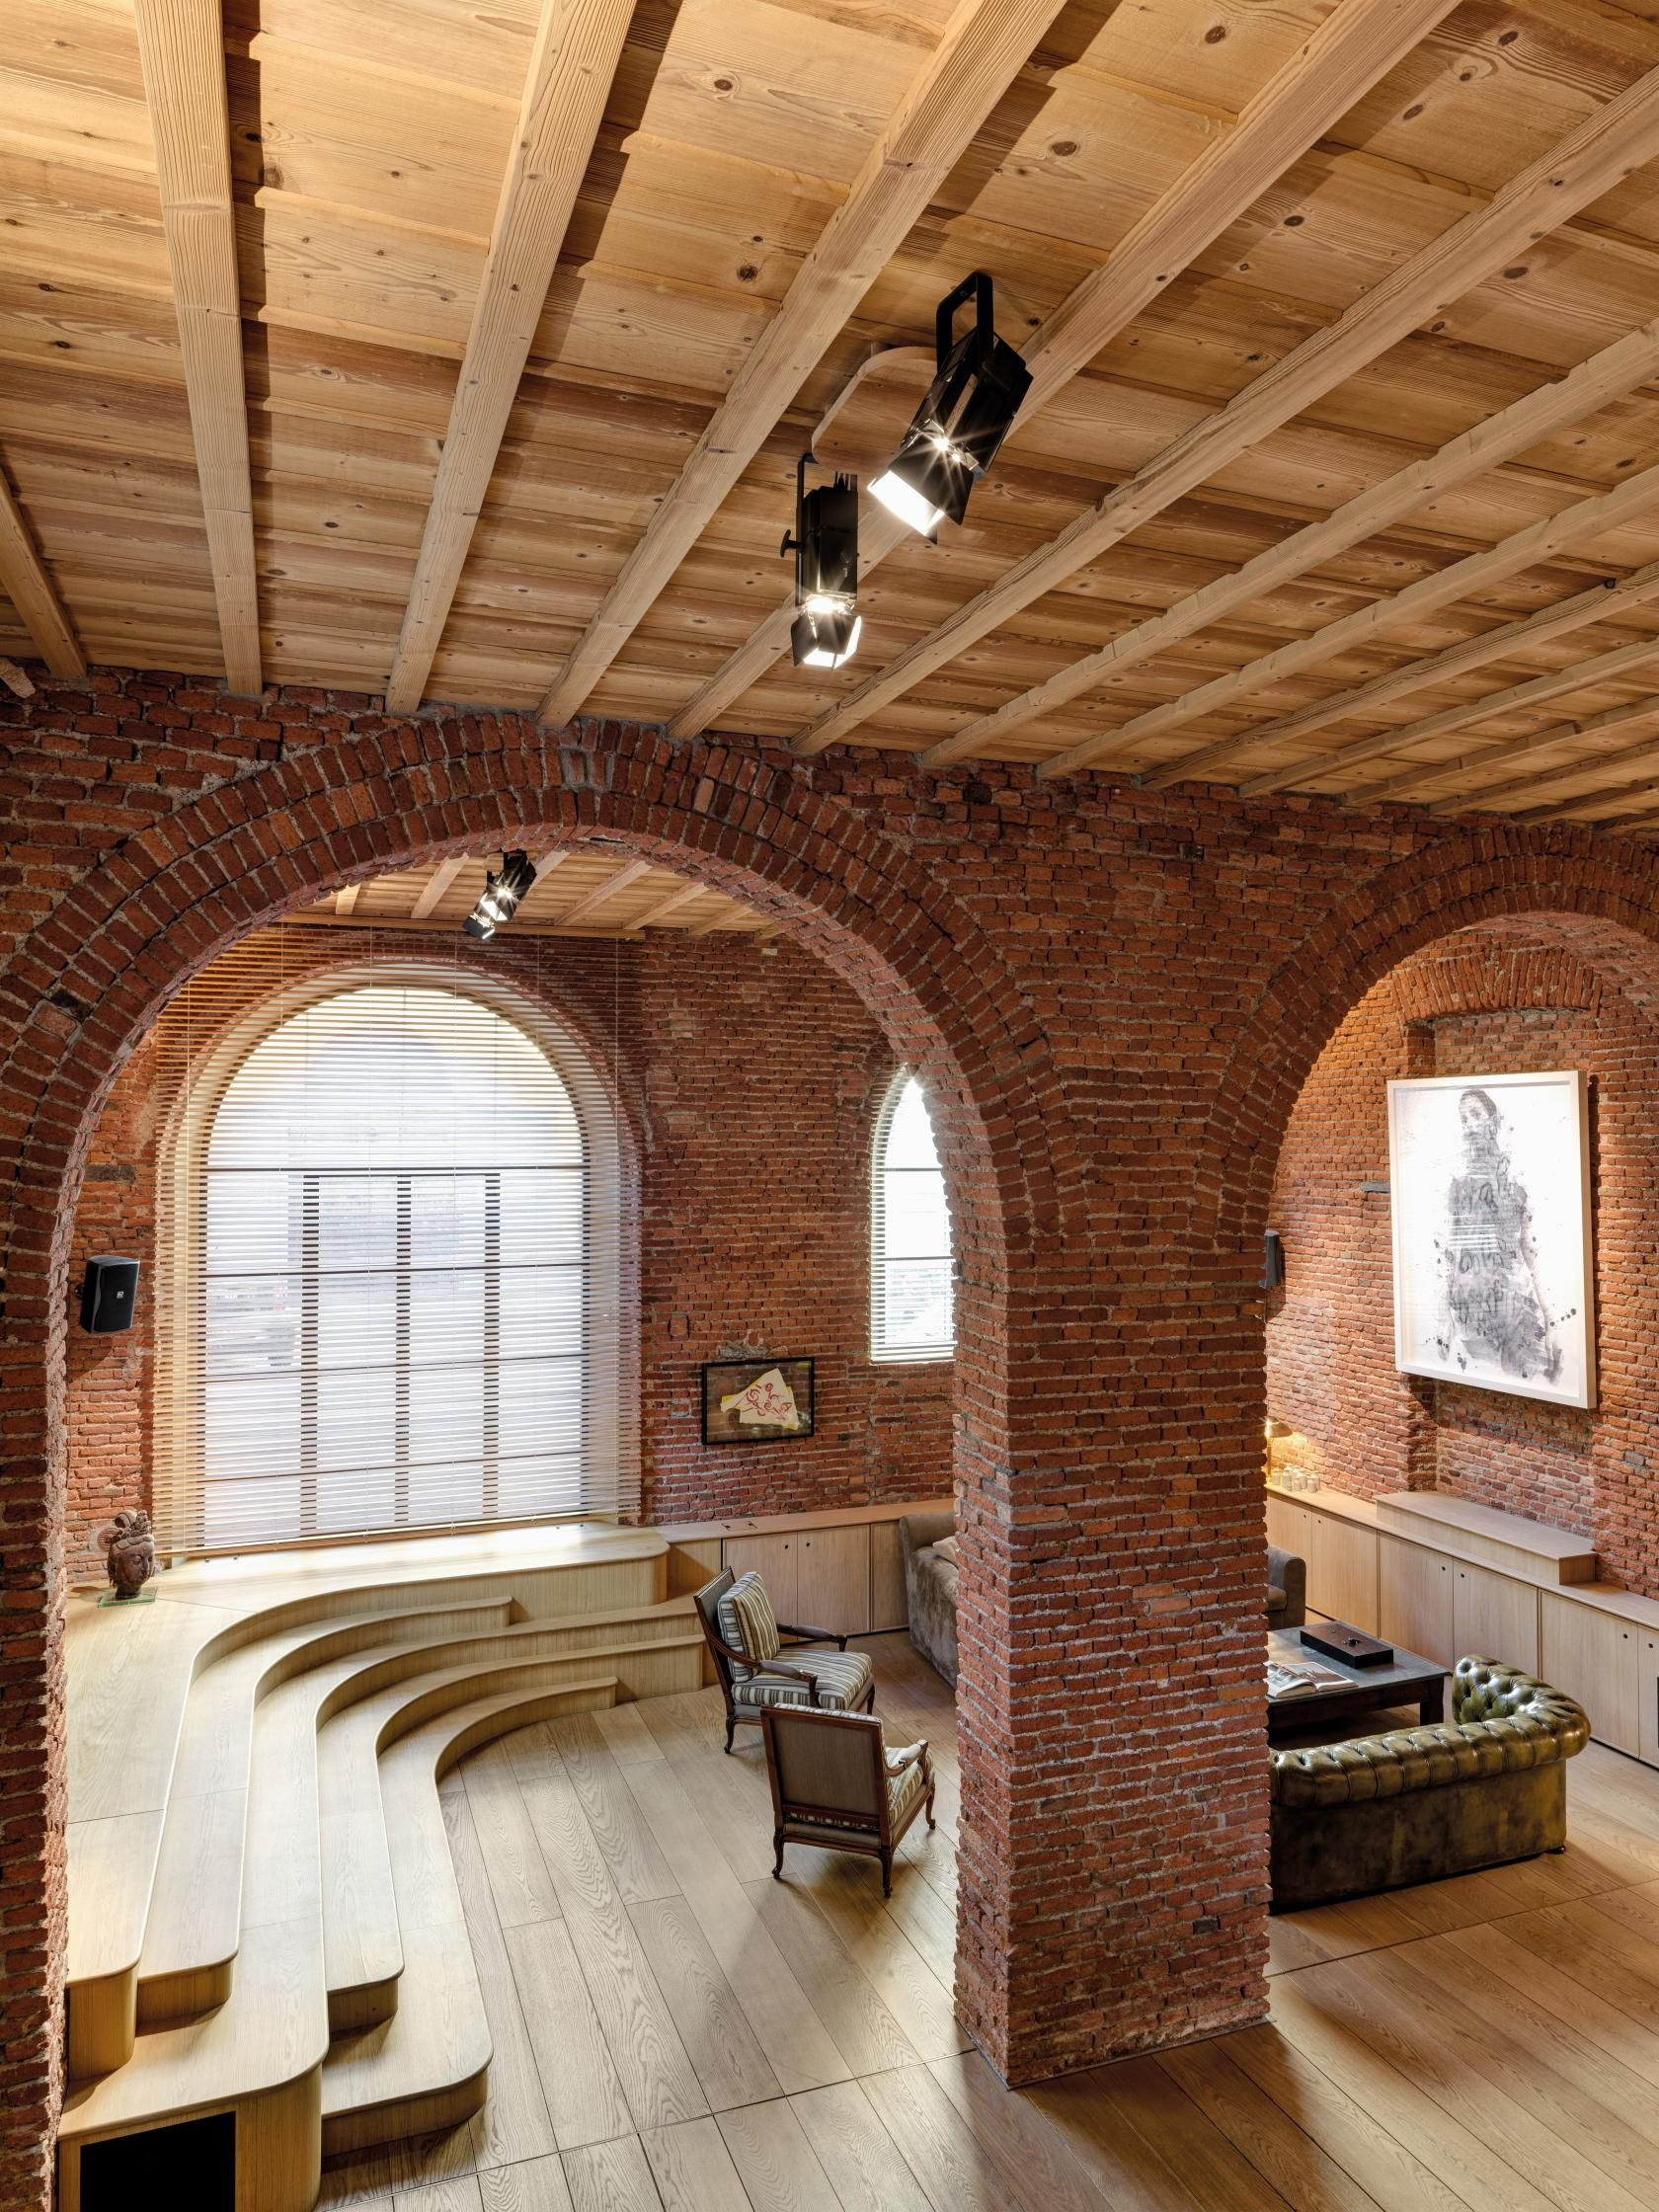 19th-Century Garage turned into Chic Loft